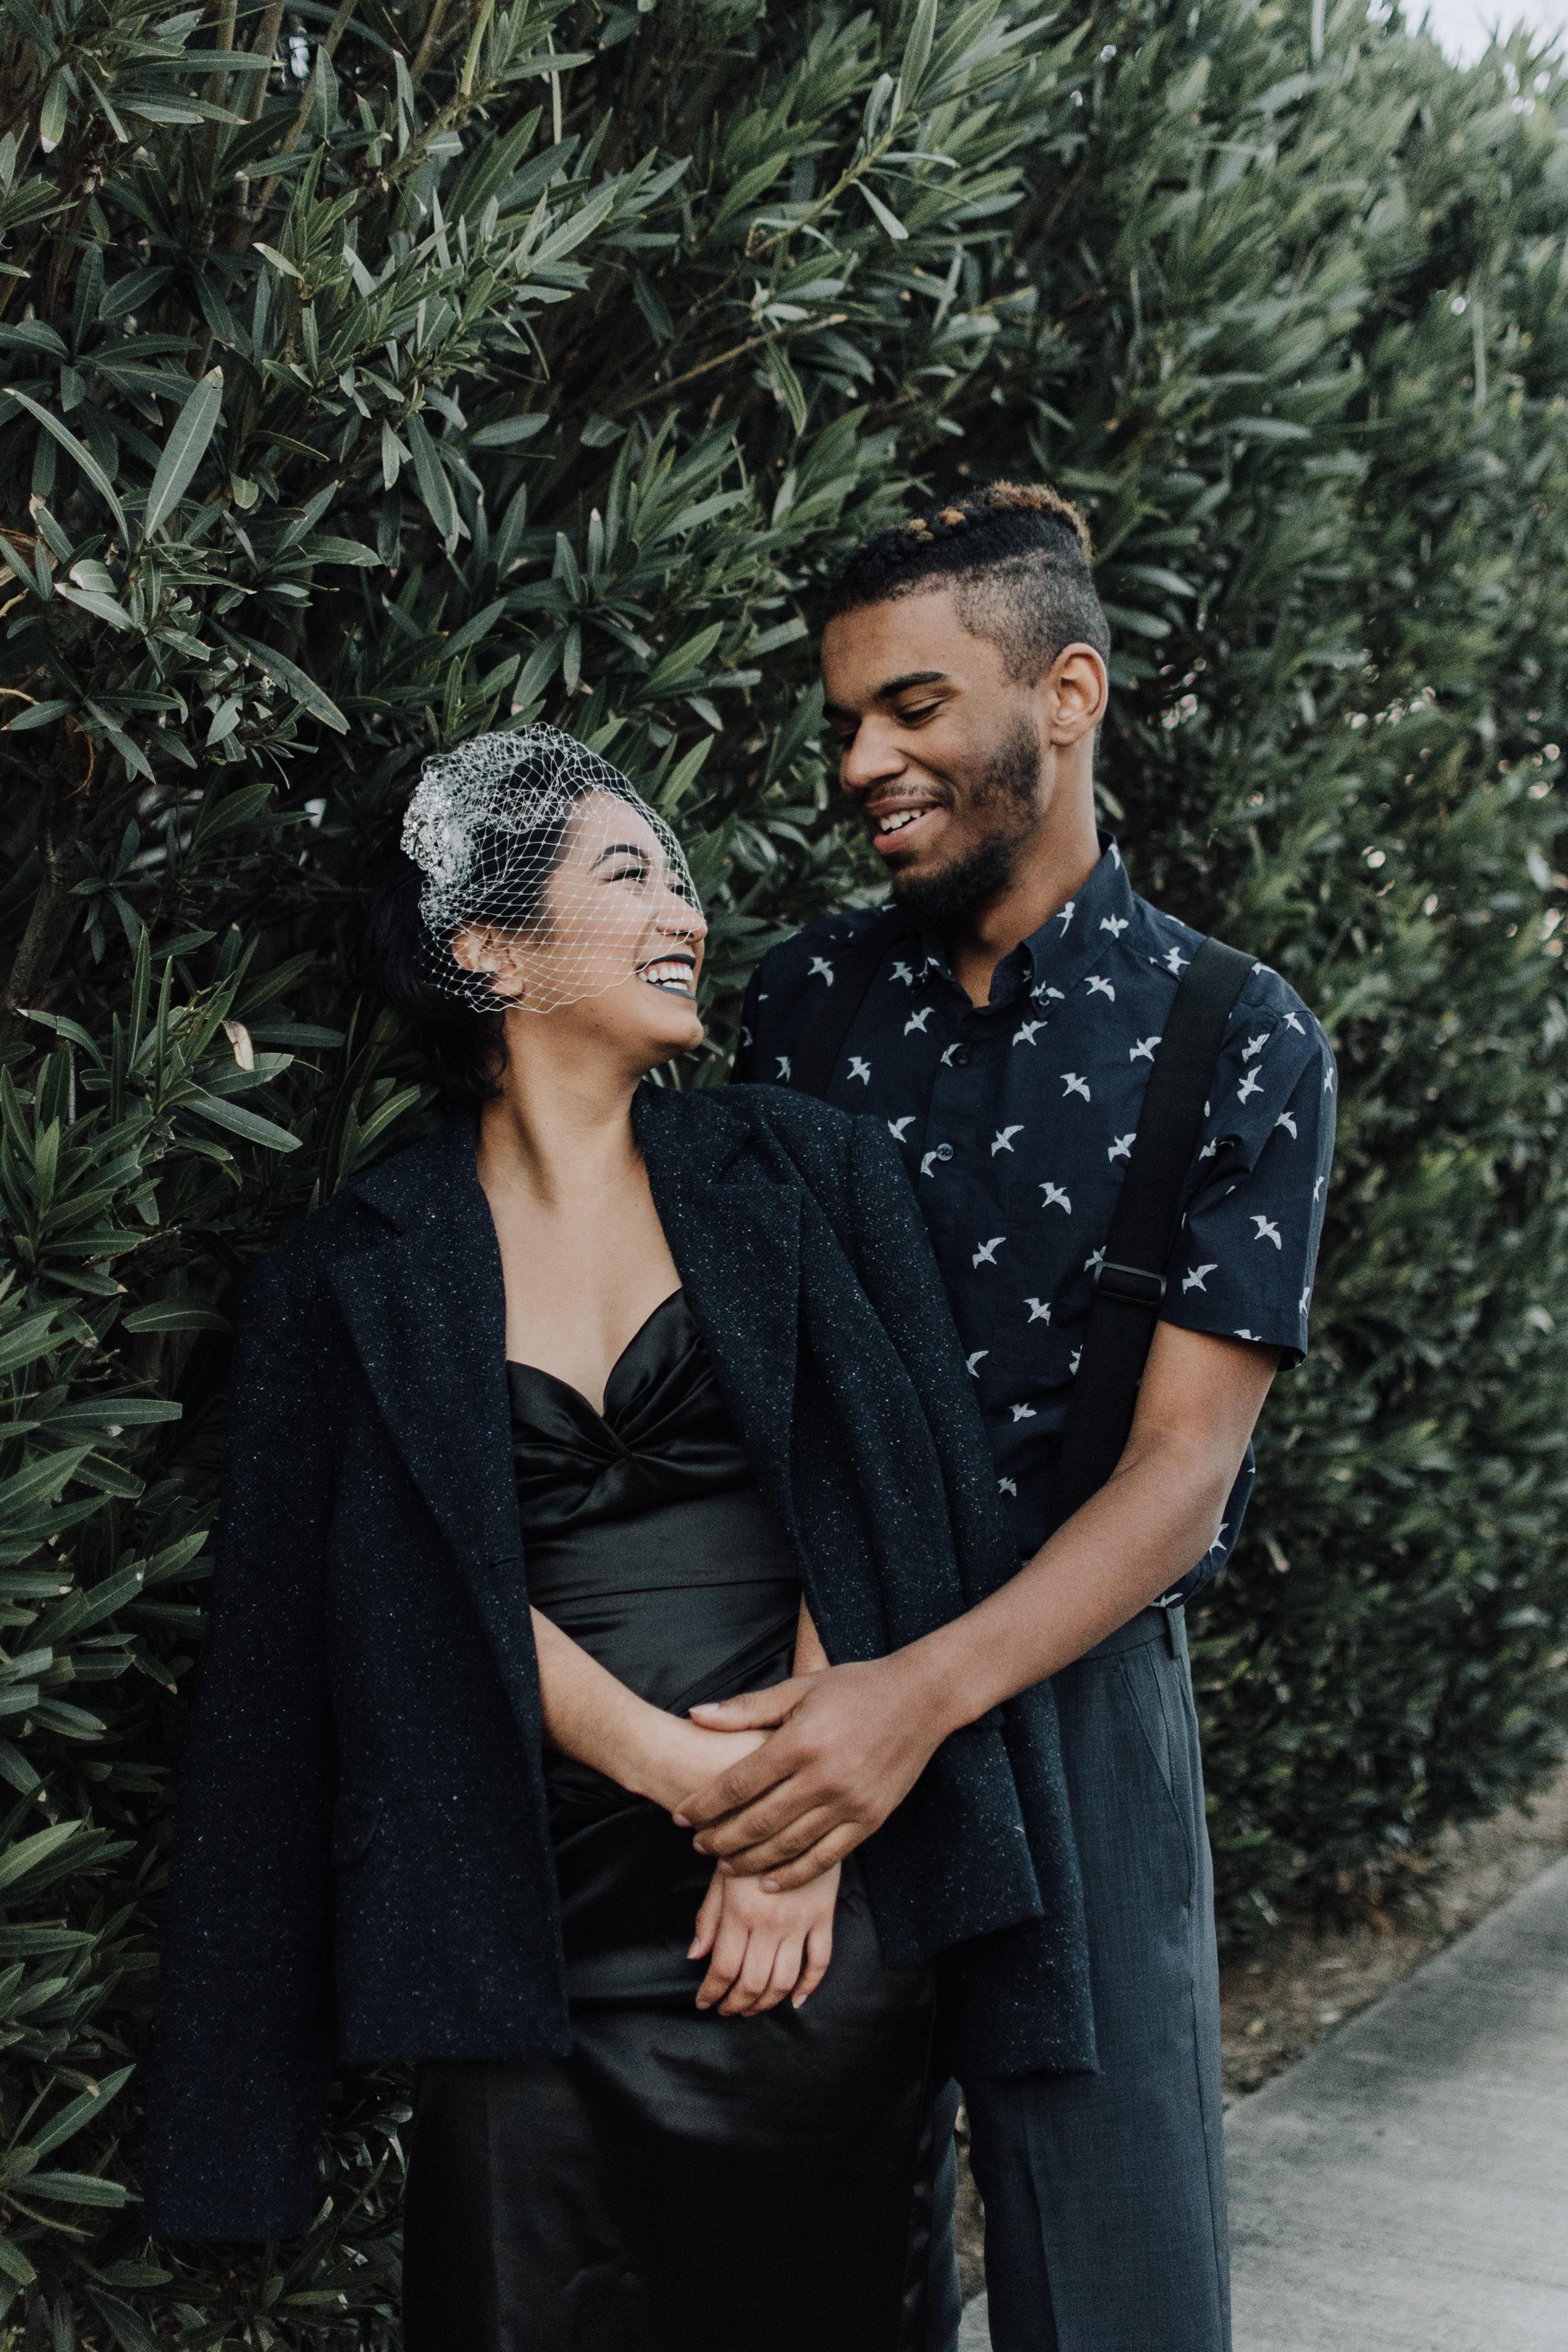 Ska Punk Psychobilly Wedding Elopement Inspiration in the San Francisco Bay Area by Helen Feliciano-Bailey